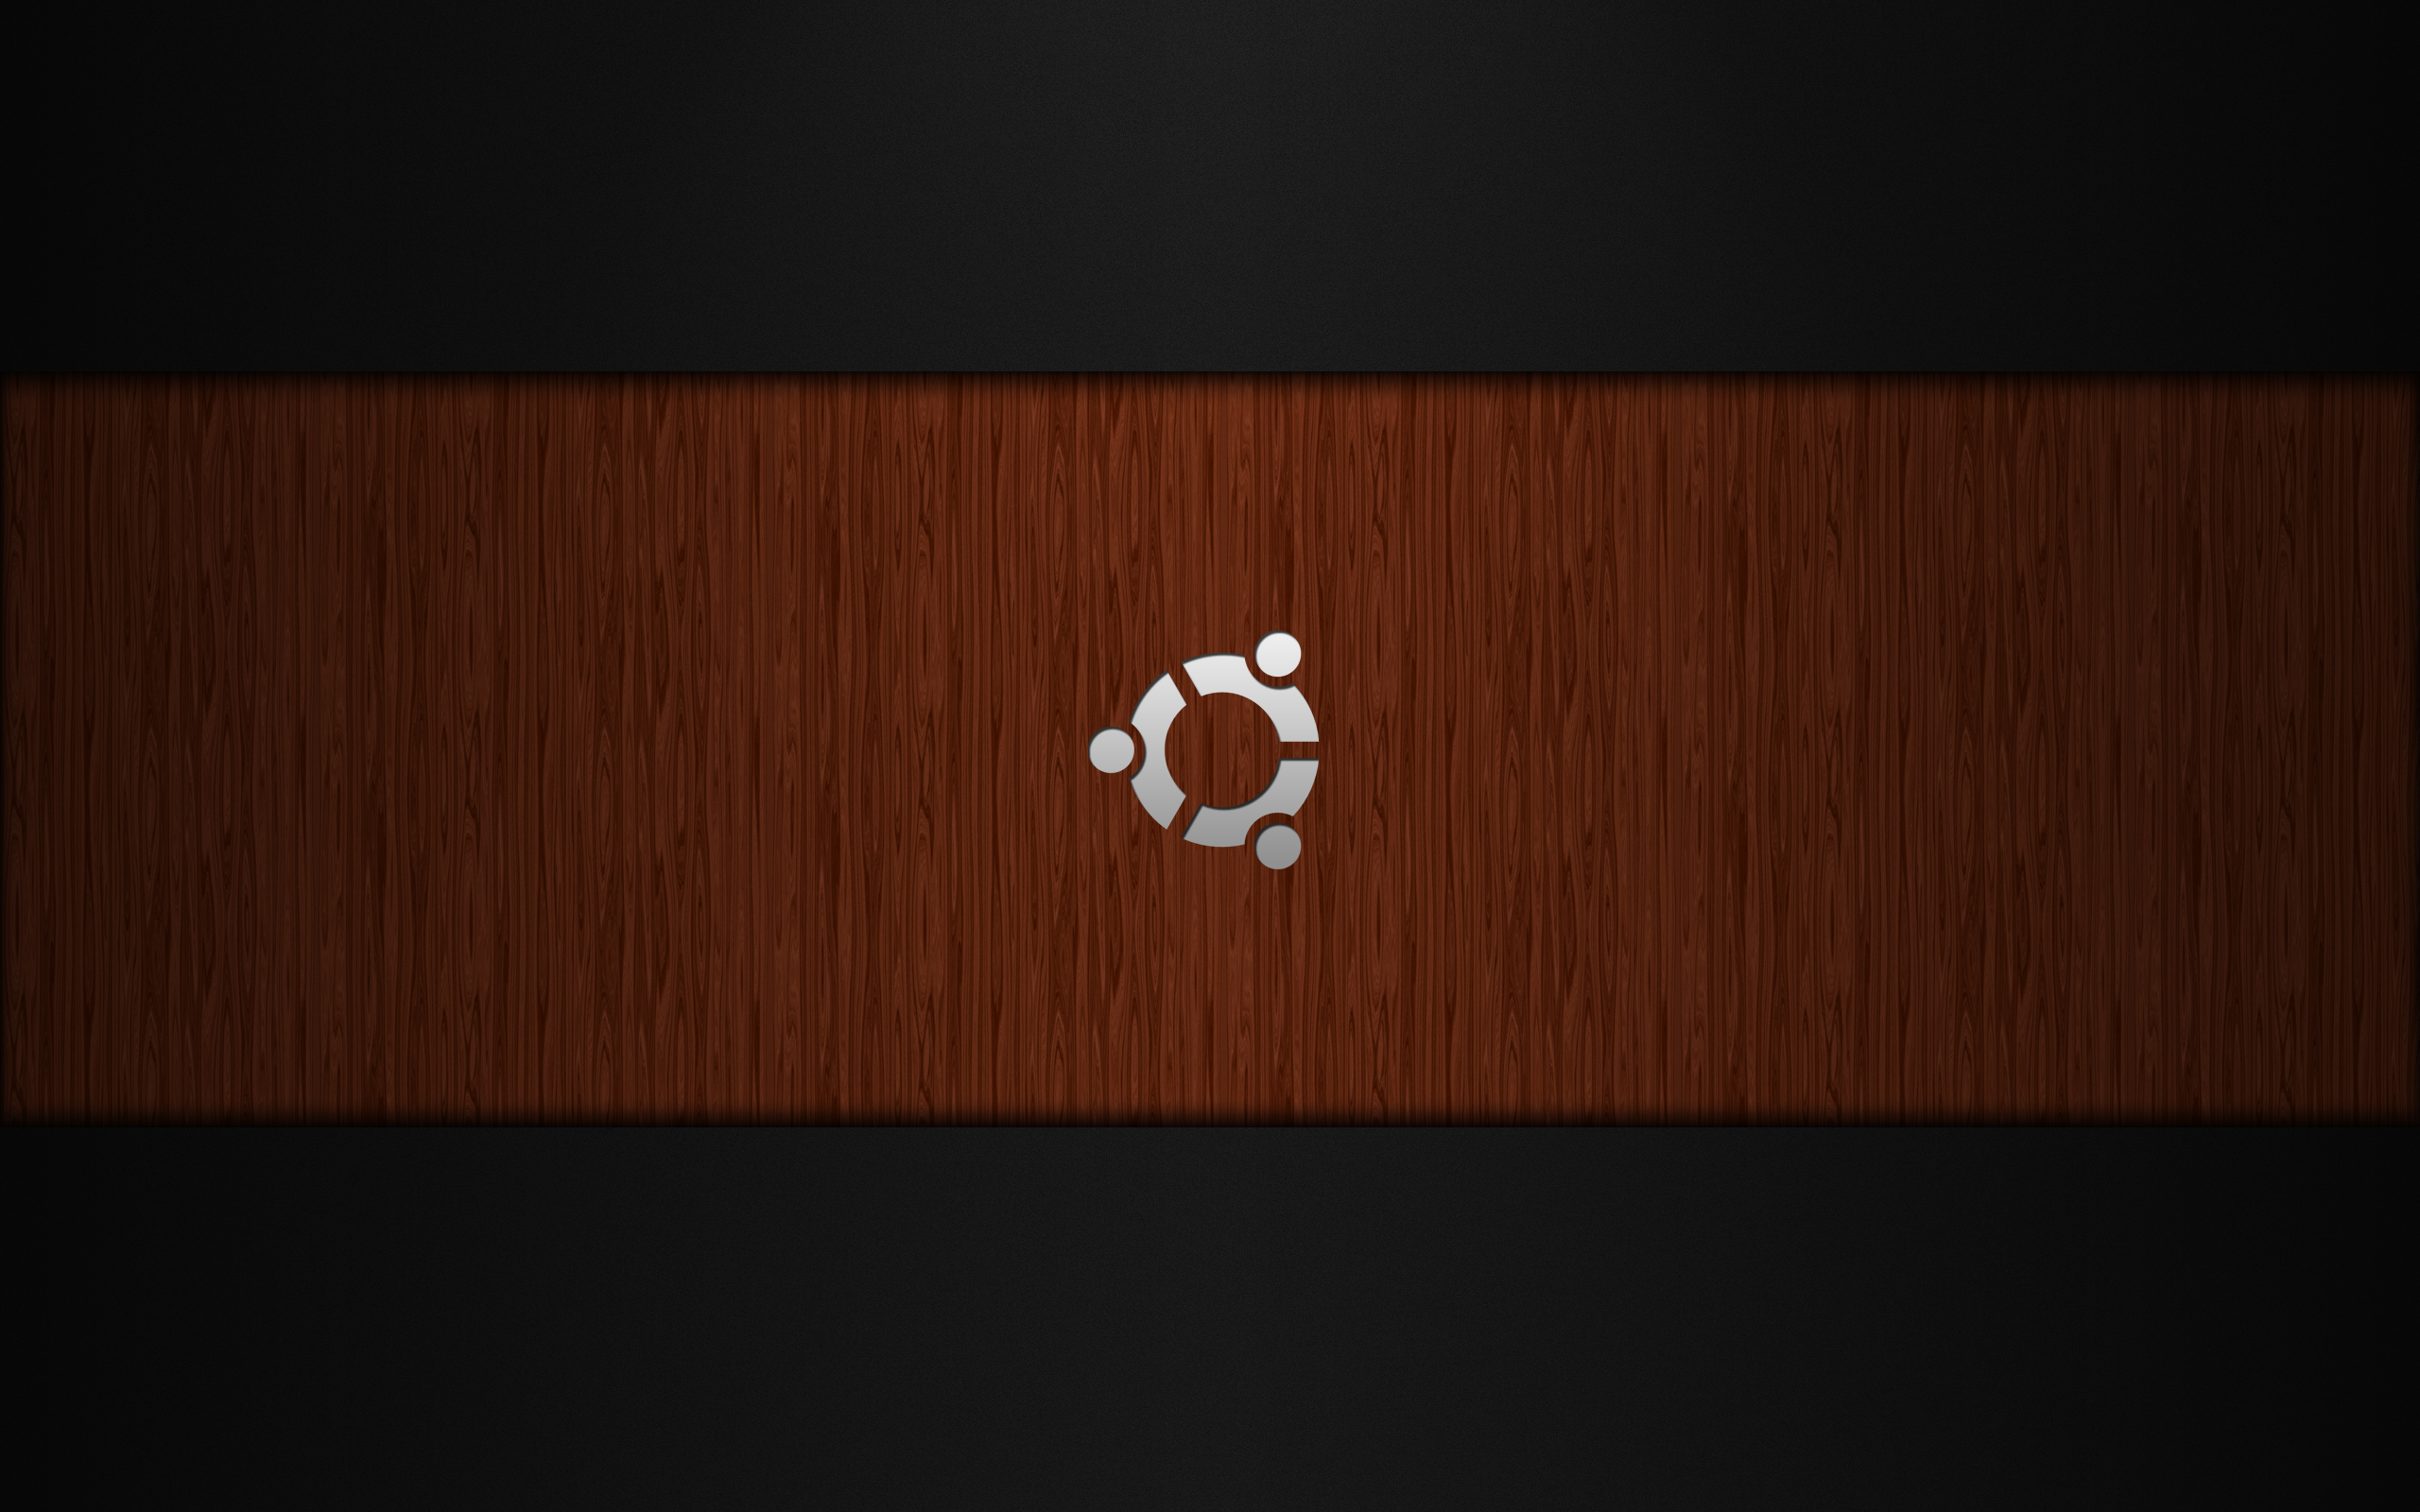 parquet ubuntu Wallpaper linux hd